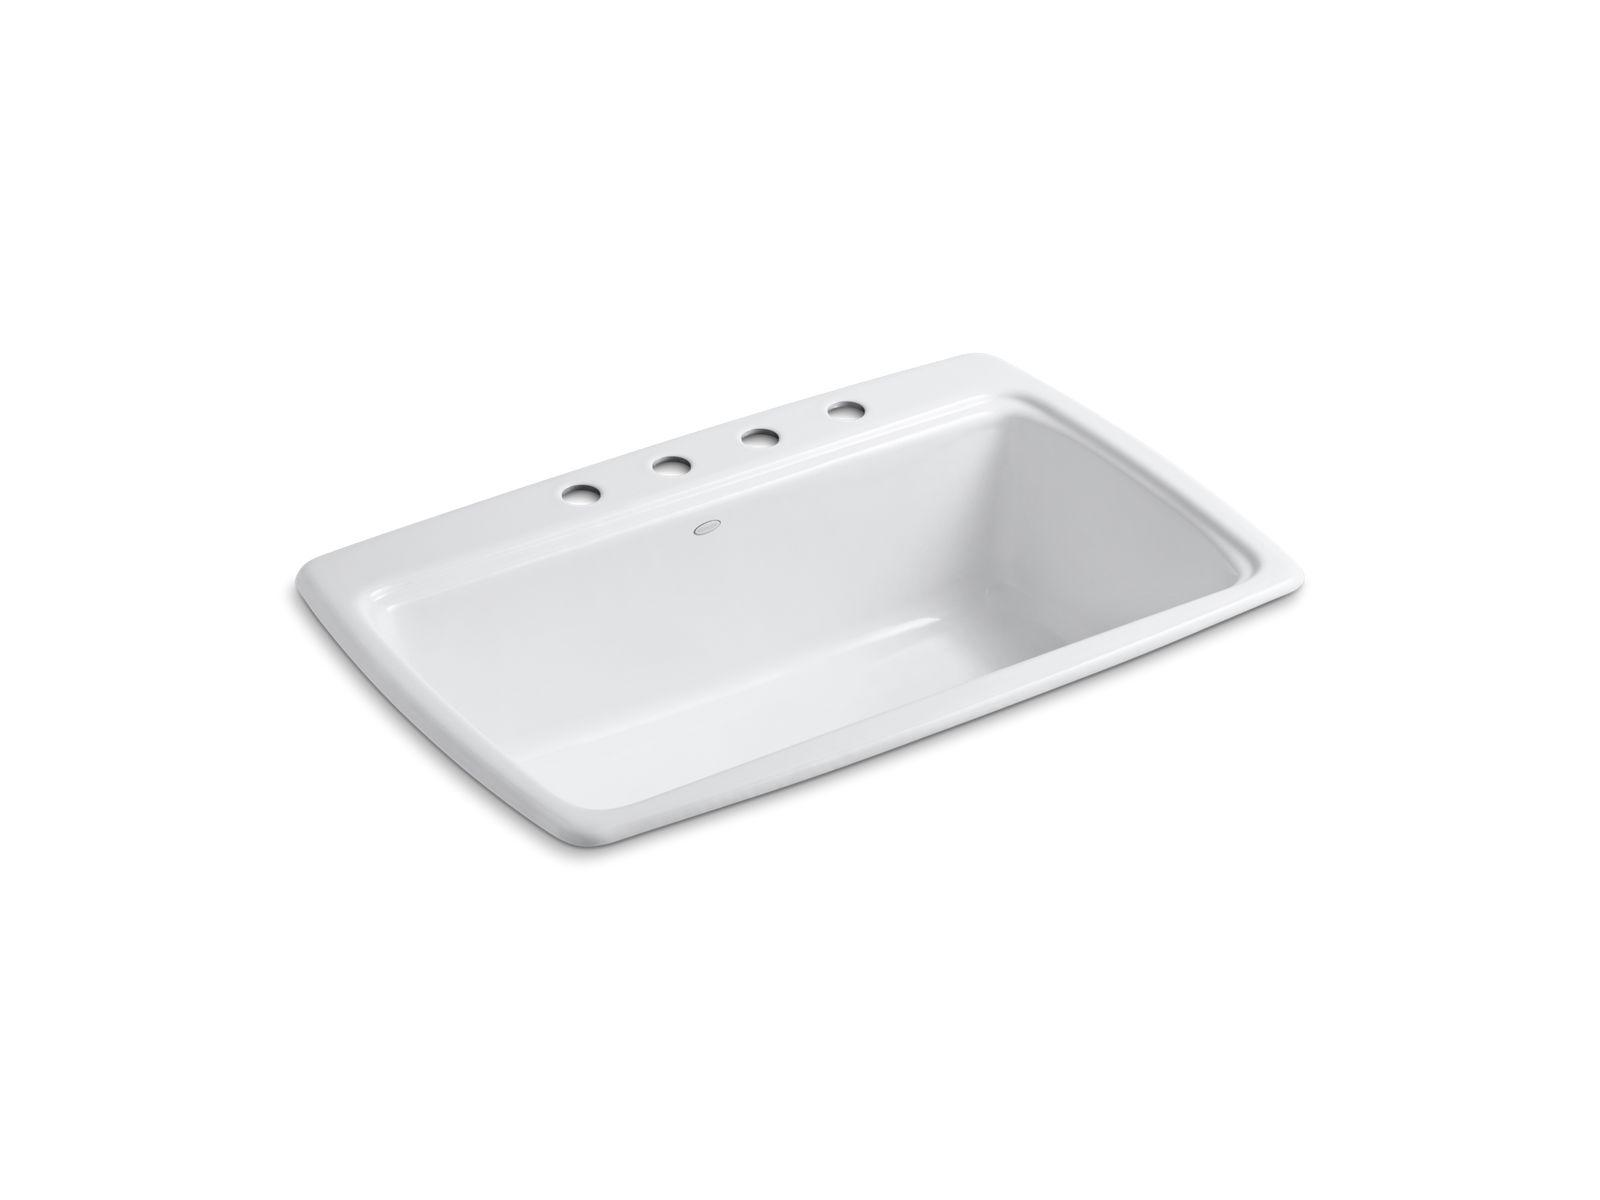 Cape Dory Top Mount Kitchen Sink With Four Faucet Holes | K 5863 4 | KOHLER